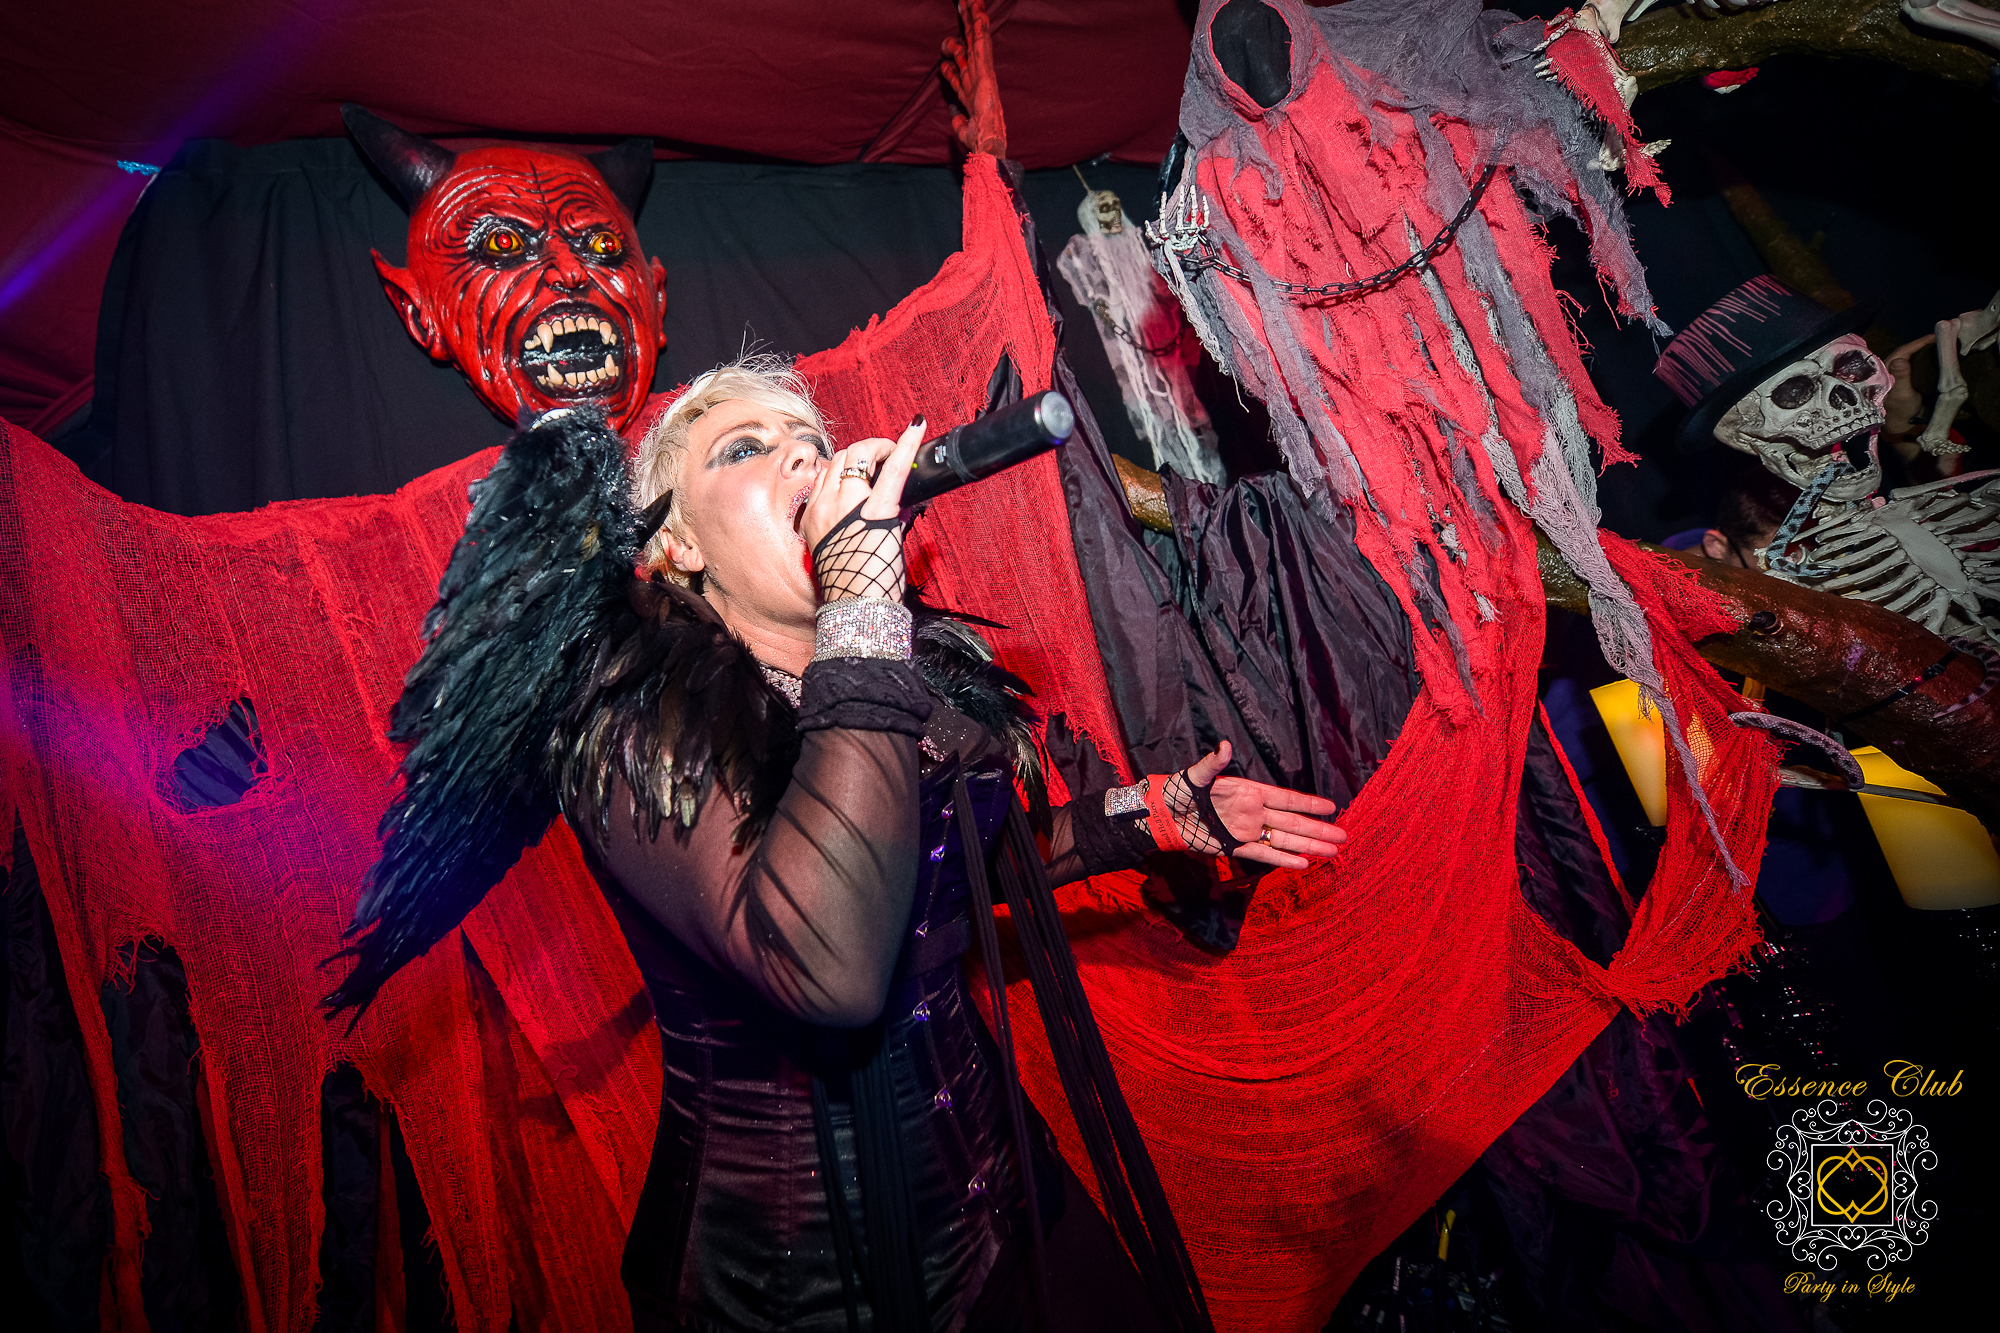 Essence club hell event singer Soraya vivian 2